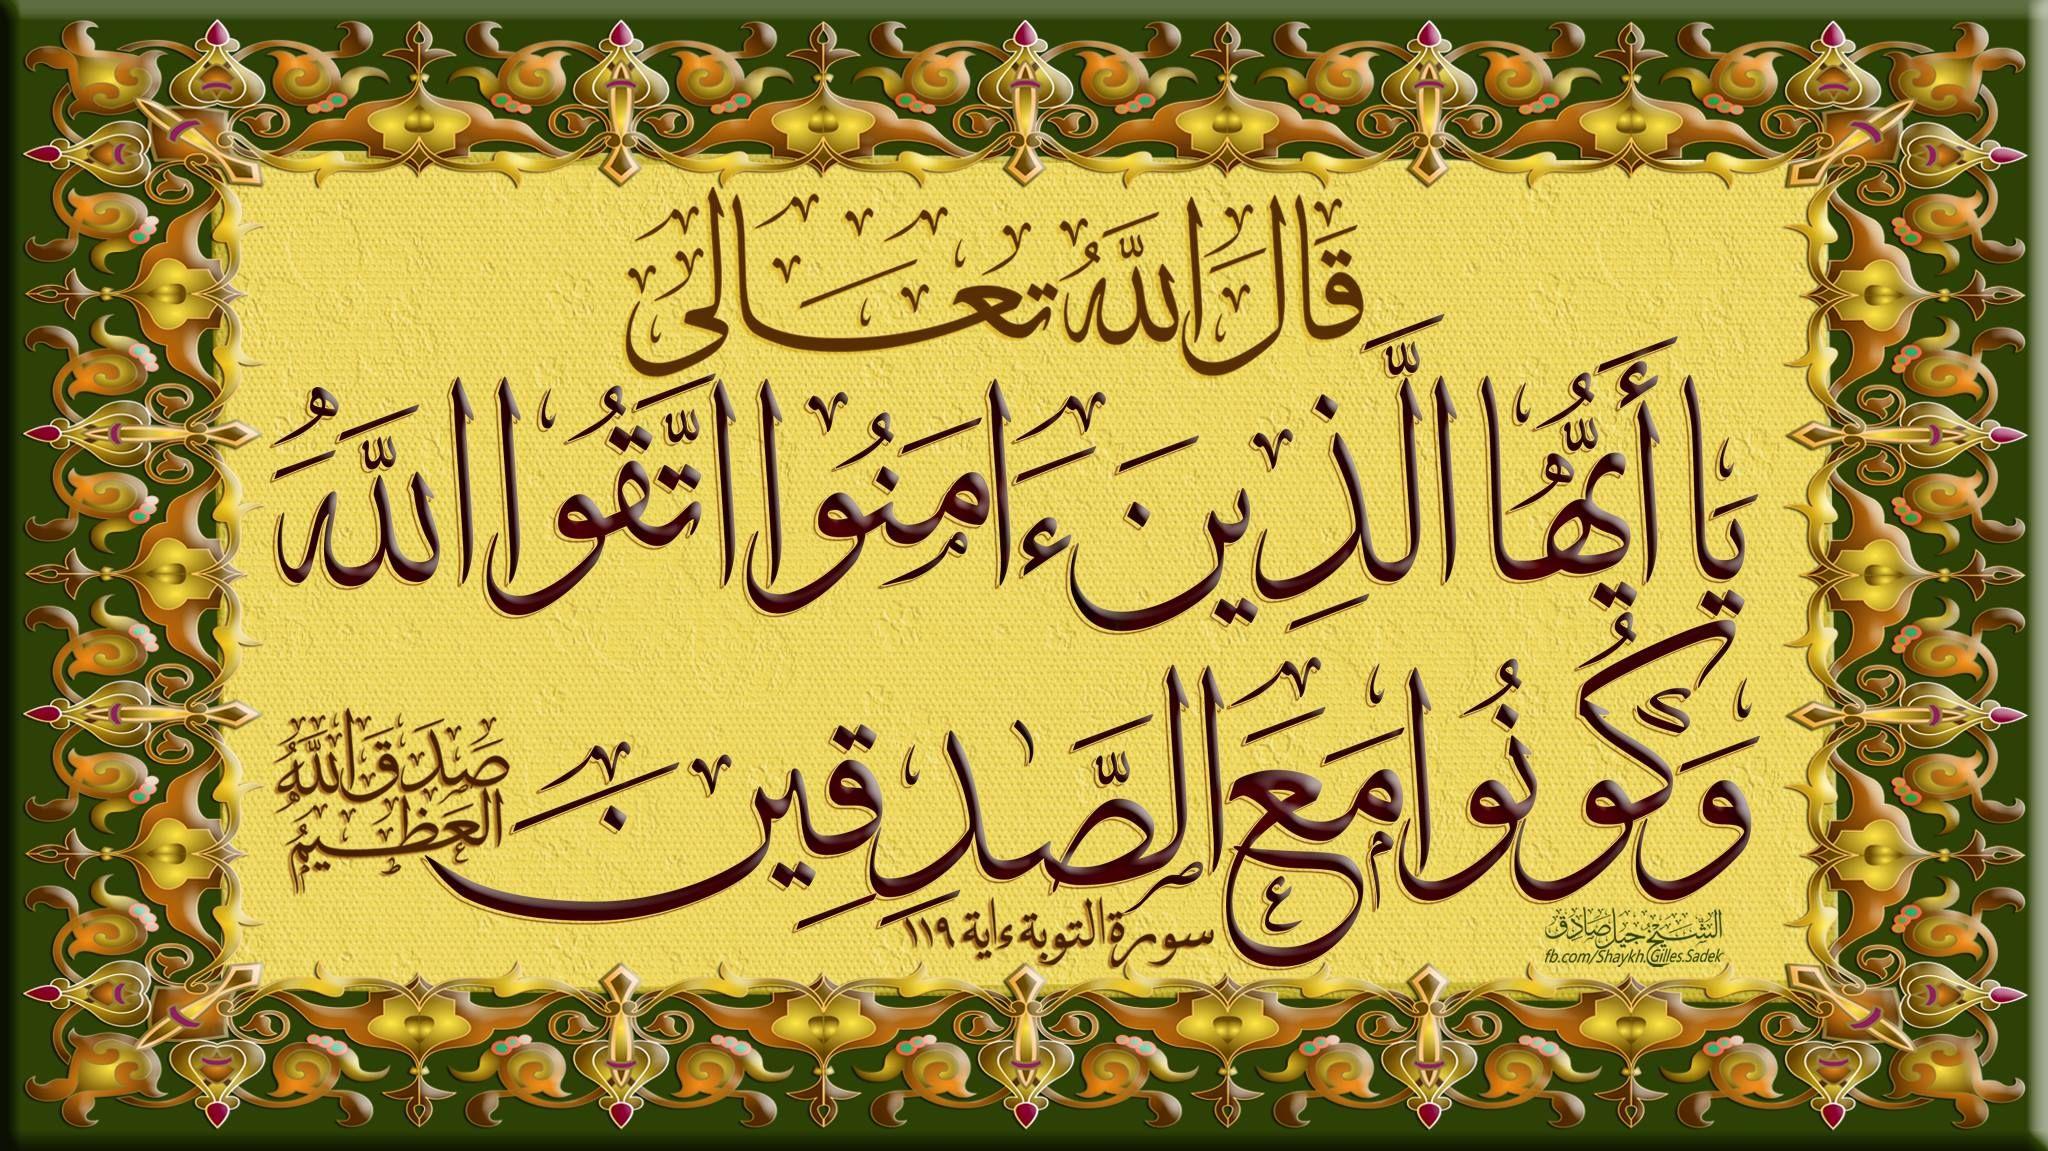 Shaykh Gilles Sadek Quran Verses Novelty Sign Novelty